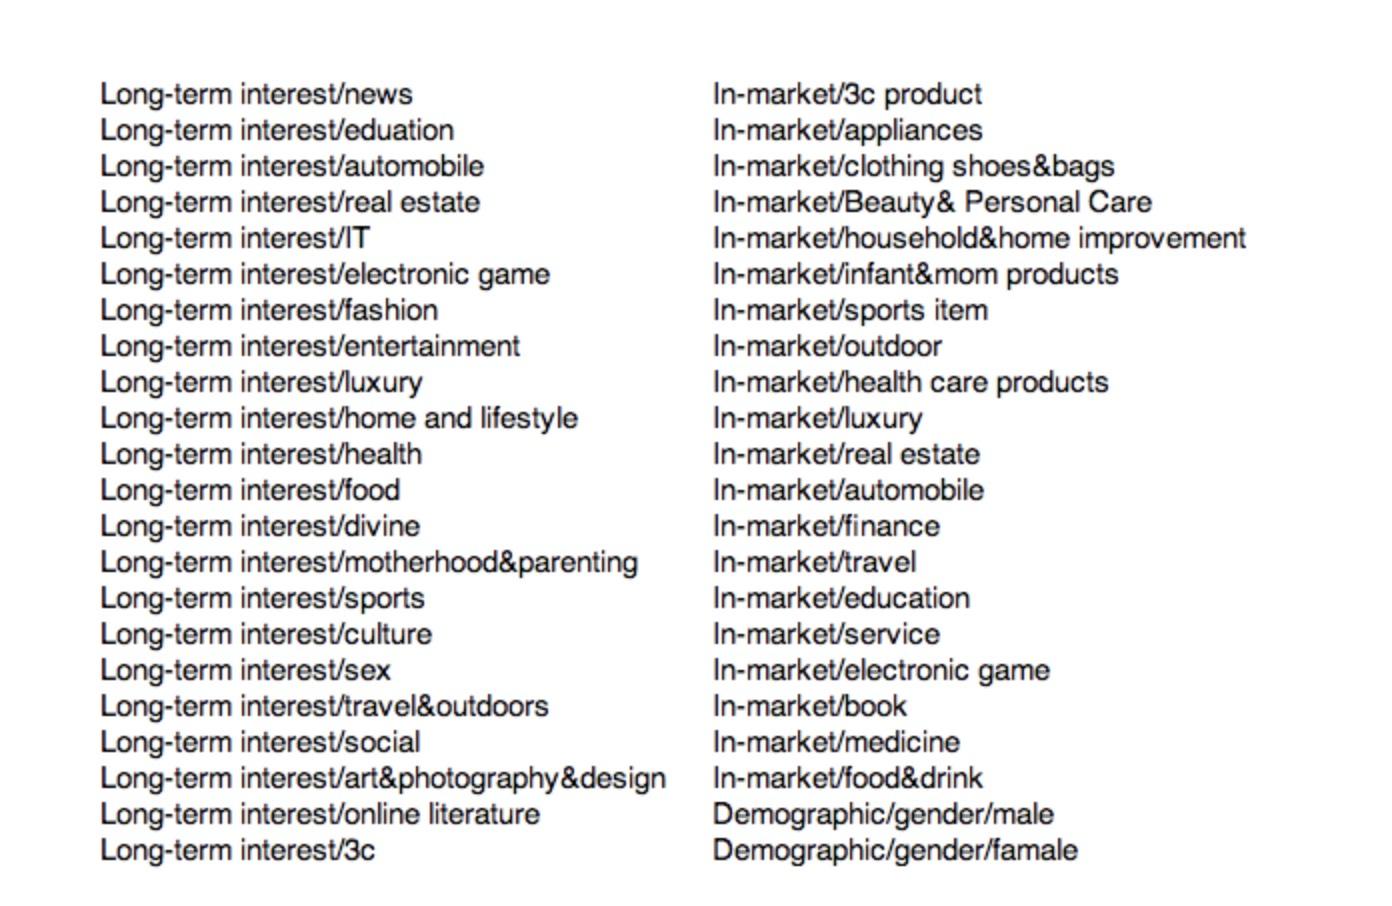 The 44 user segments of the iPinYou dataset